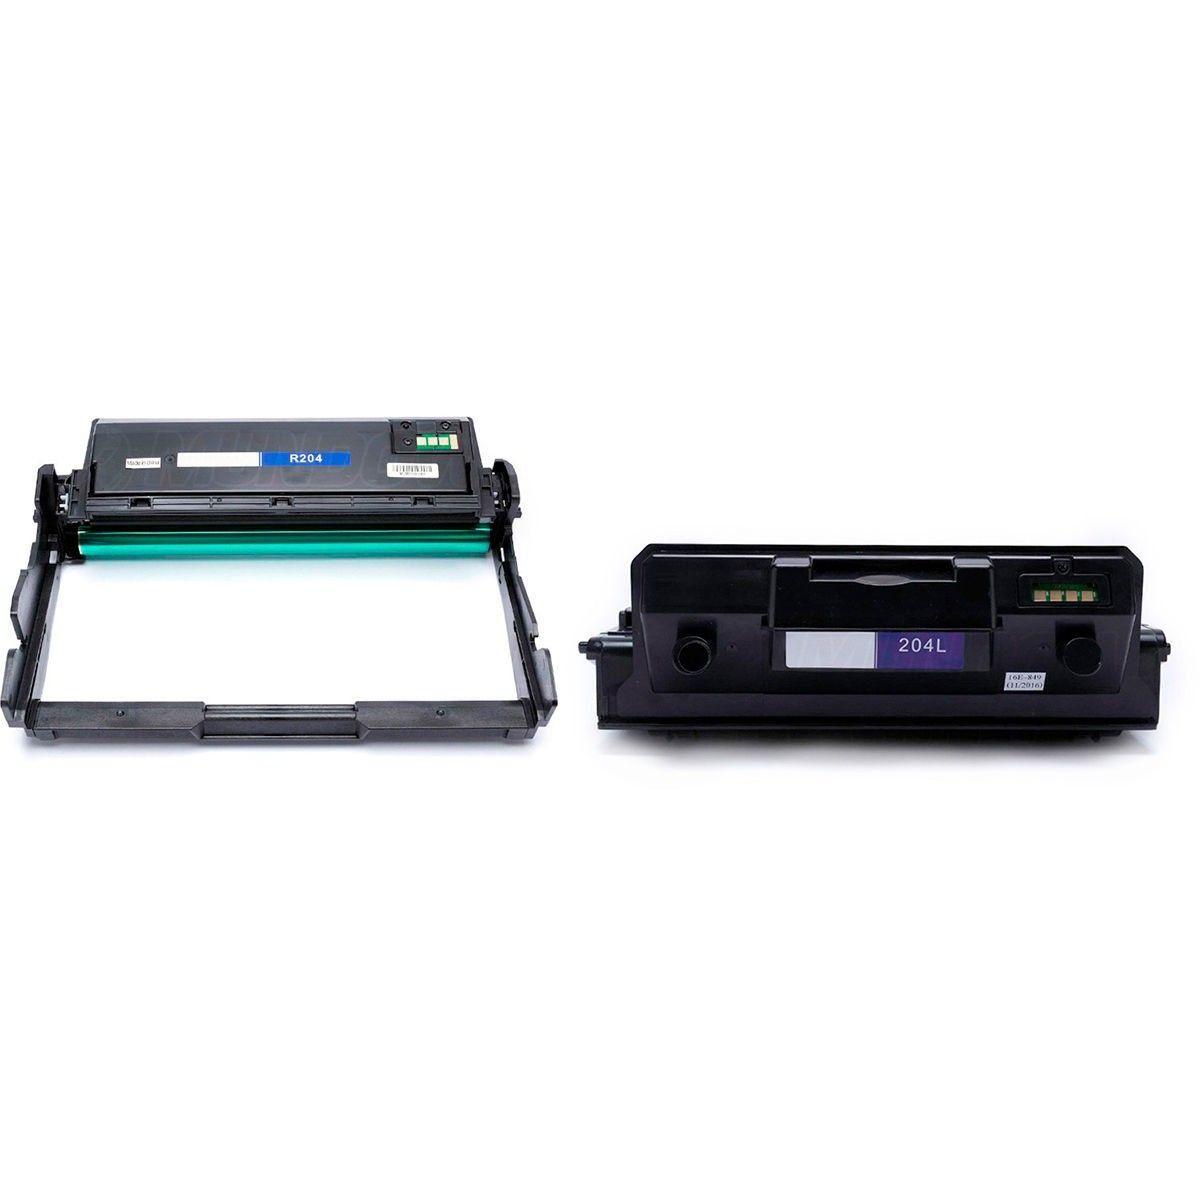 Compatível: Combo Cartucho de Cilindro R204 + Toner D204L para Samsung M3325nd M3825dw M3875fd M4025nd M4075fw 3325 4025